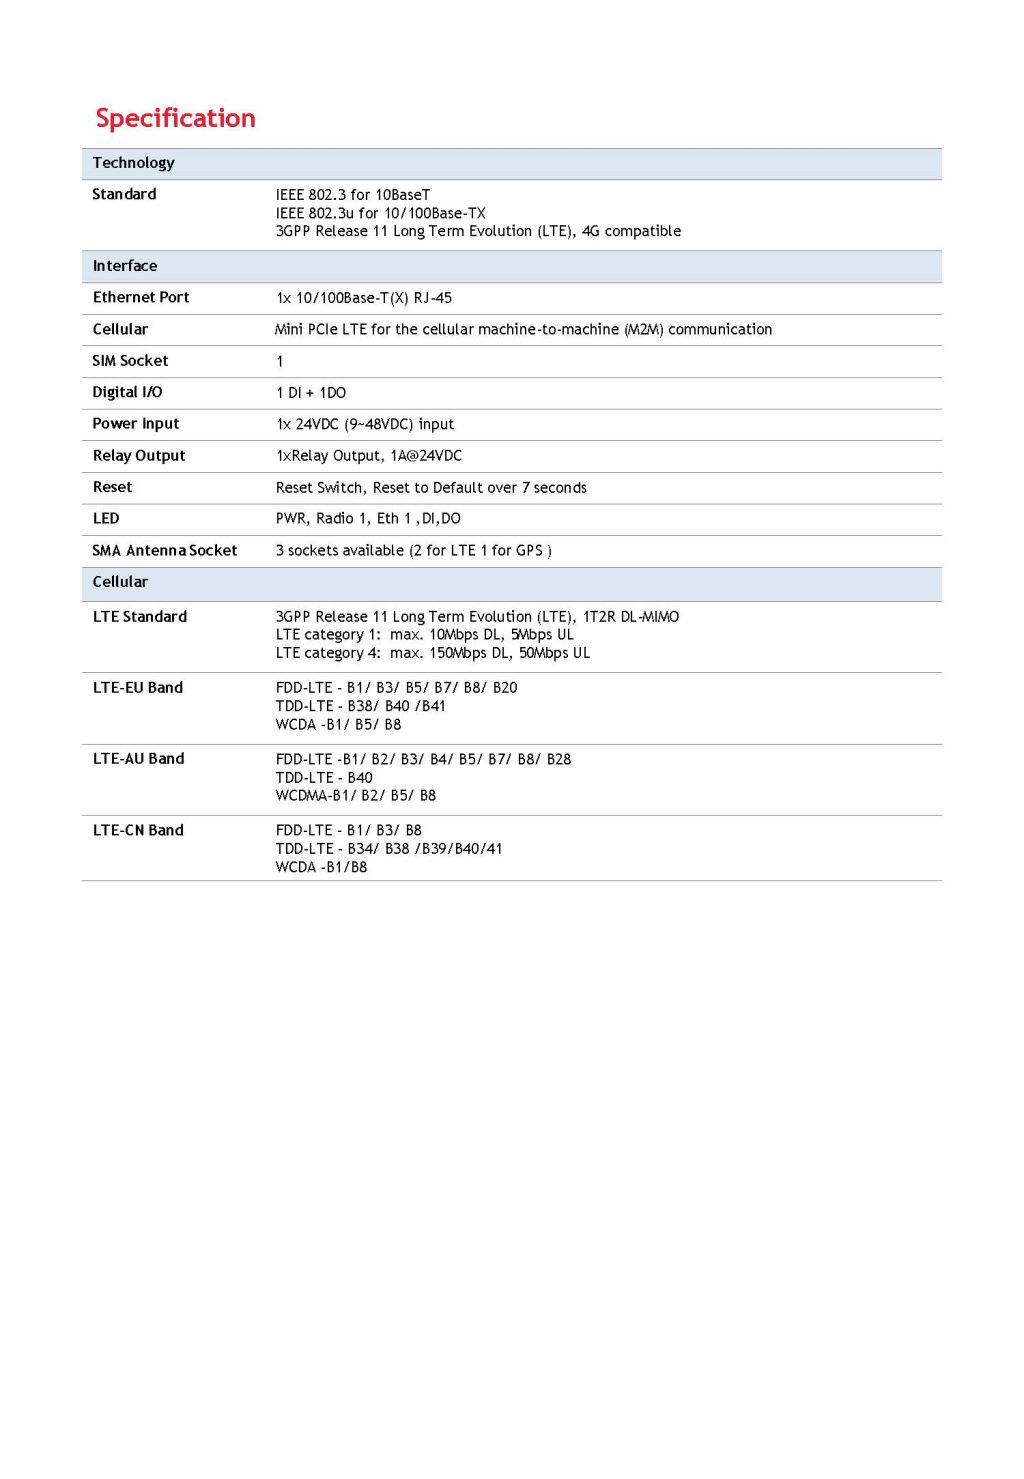 Korenix JetWave 2411L/2111L Industrial Cellular Router/Gateway